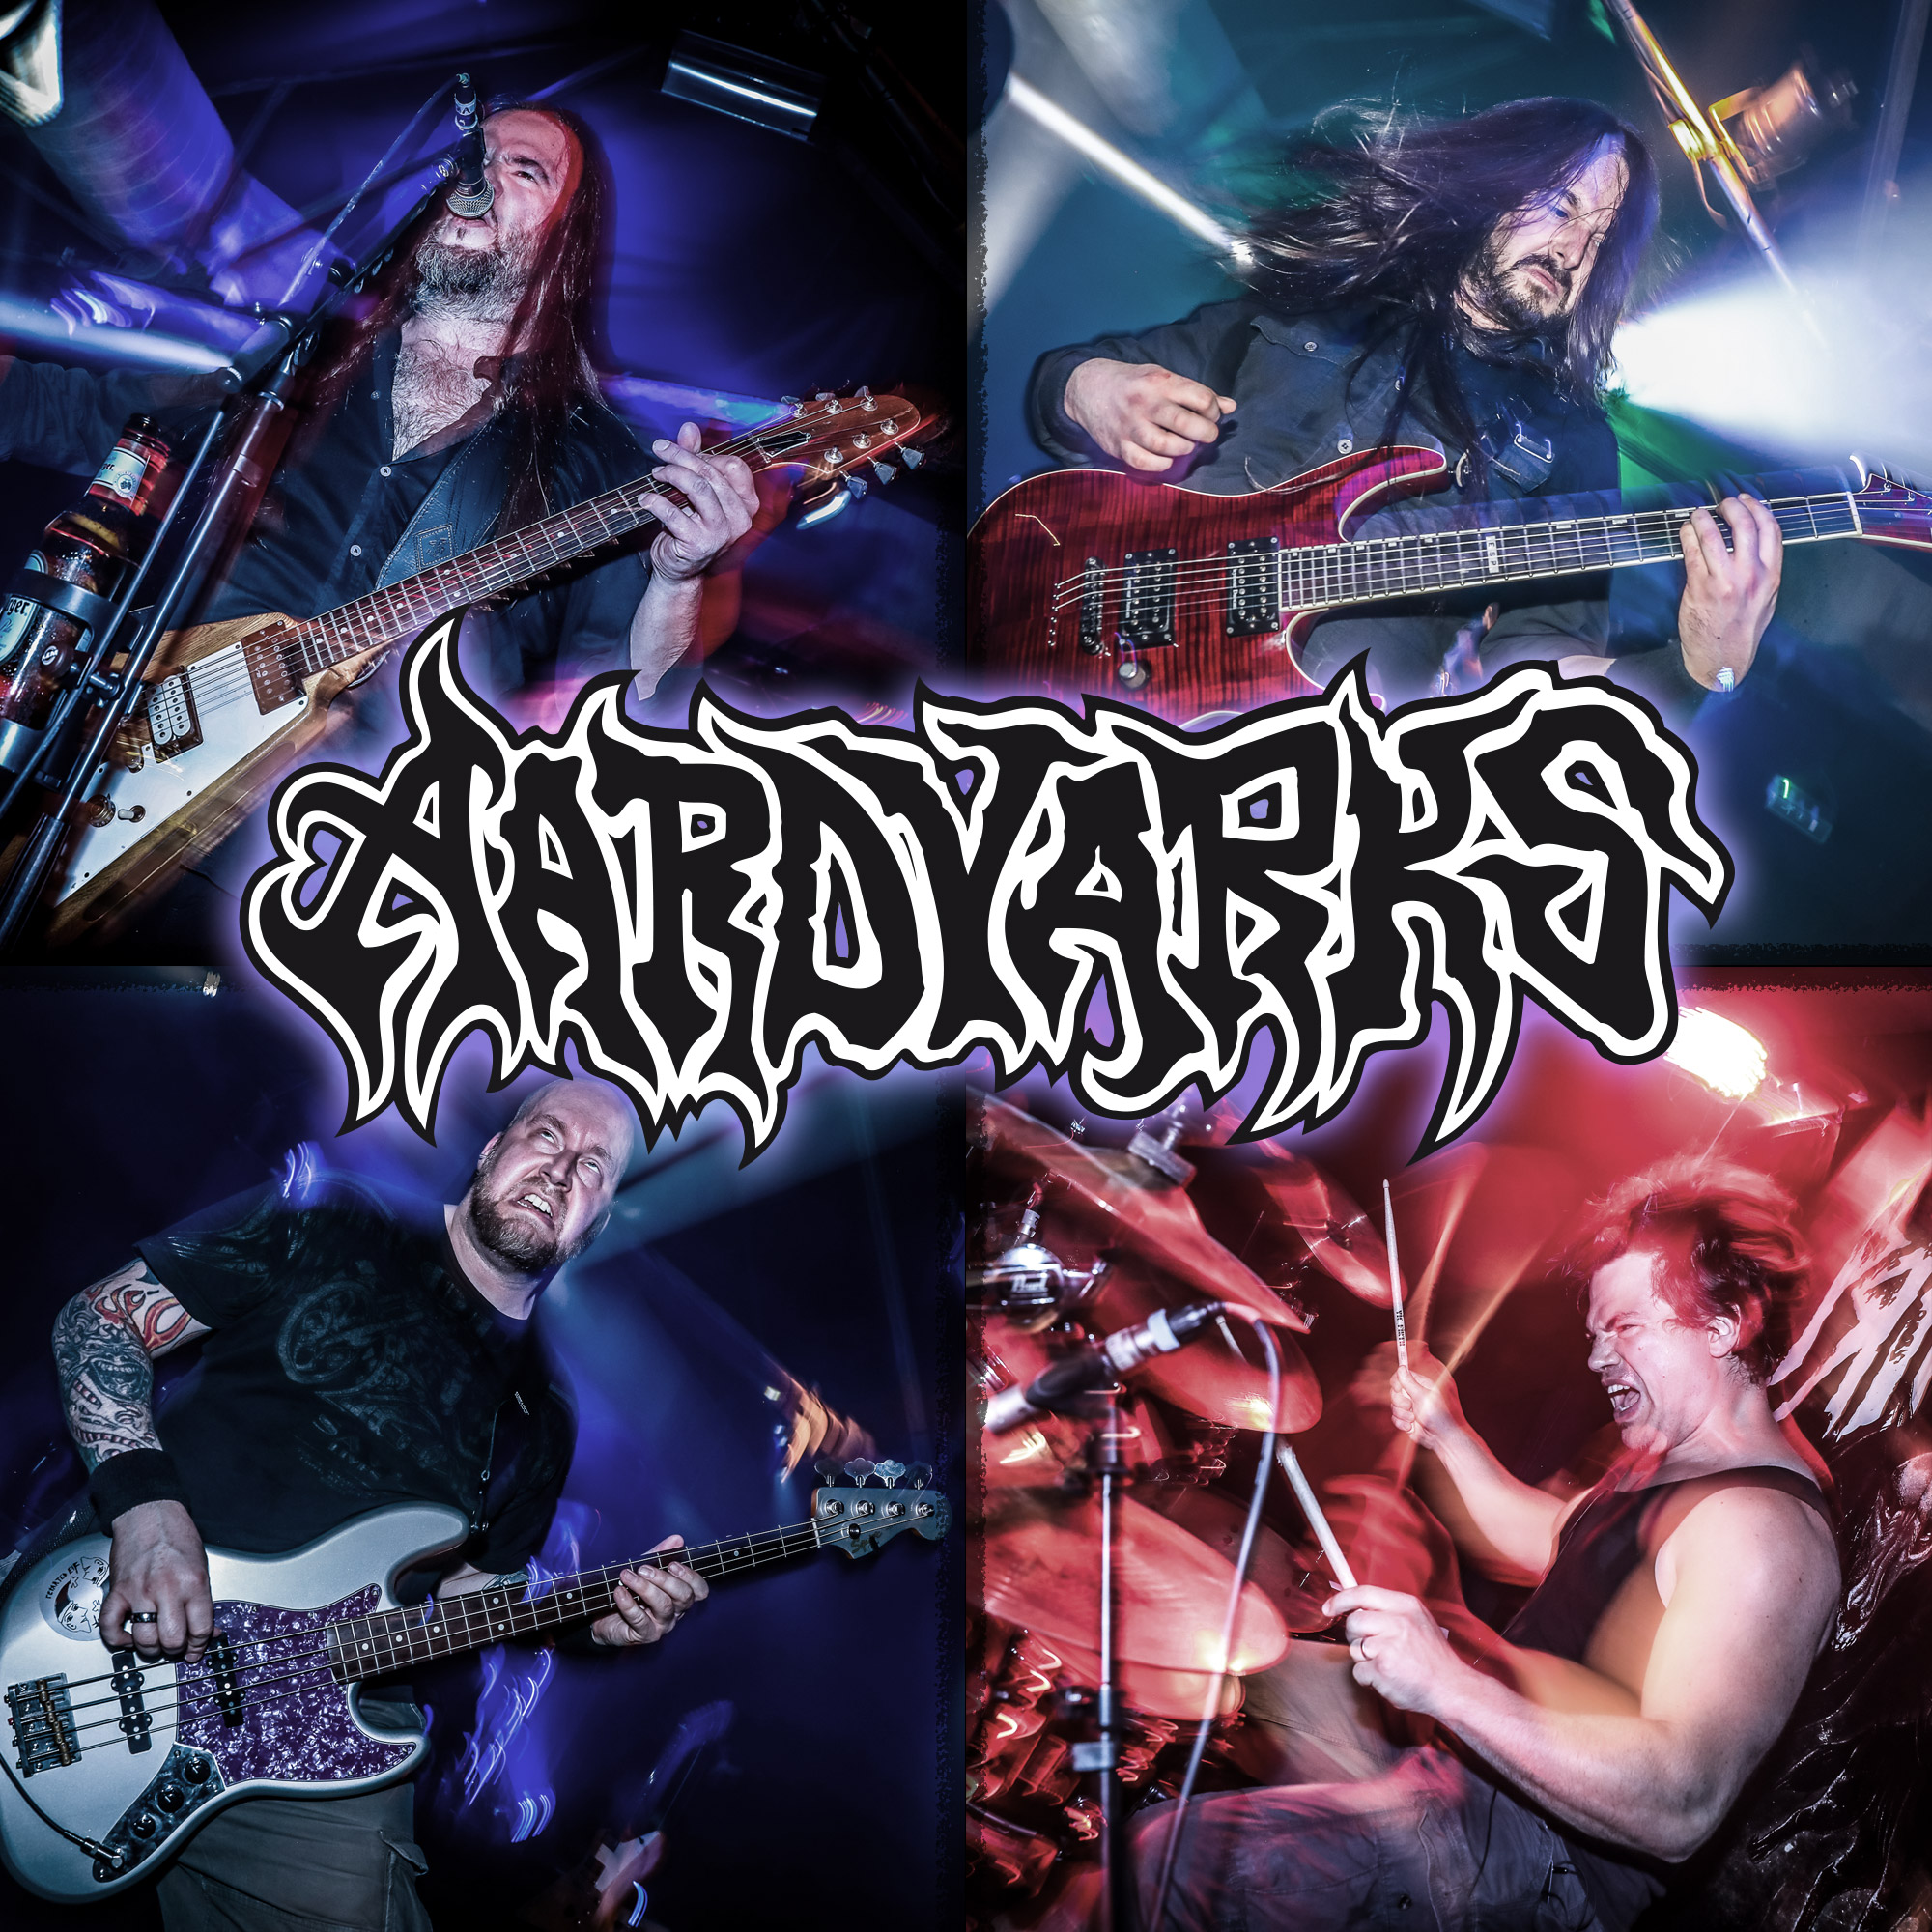 AARDVARKS Band 2018 by monsterpics.de